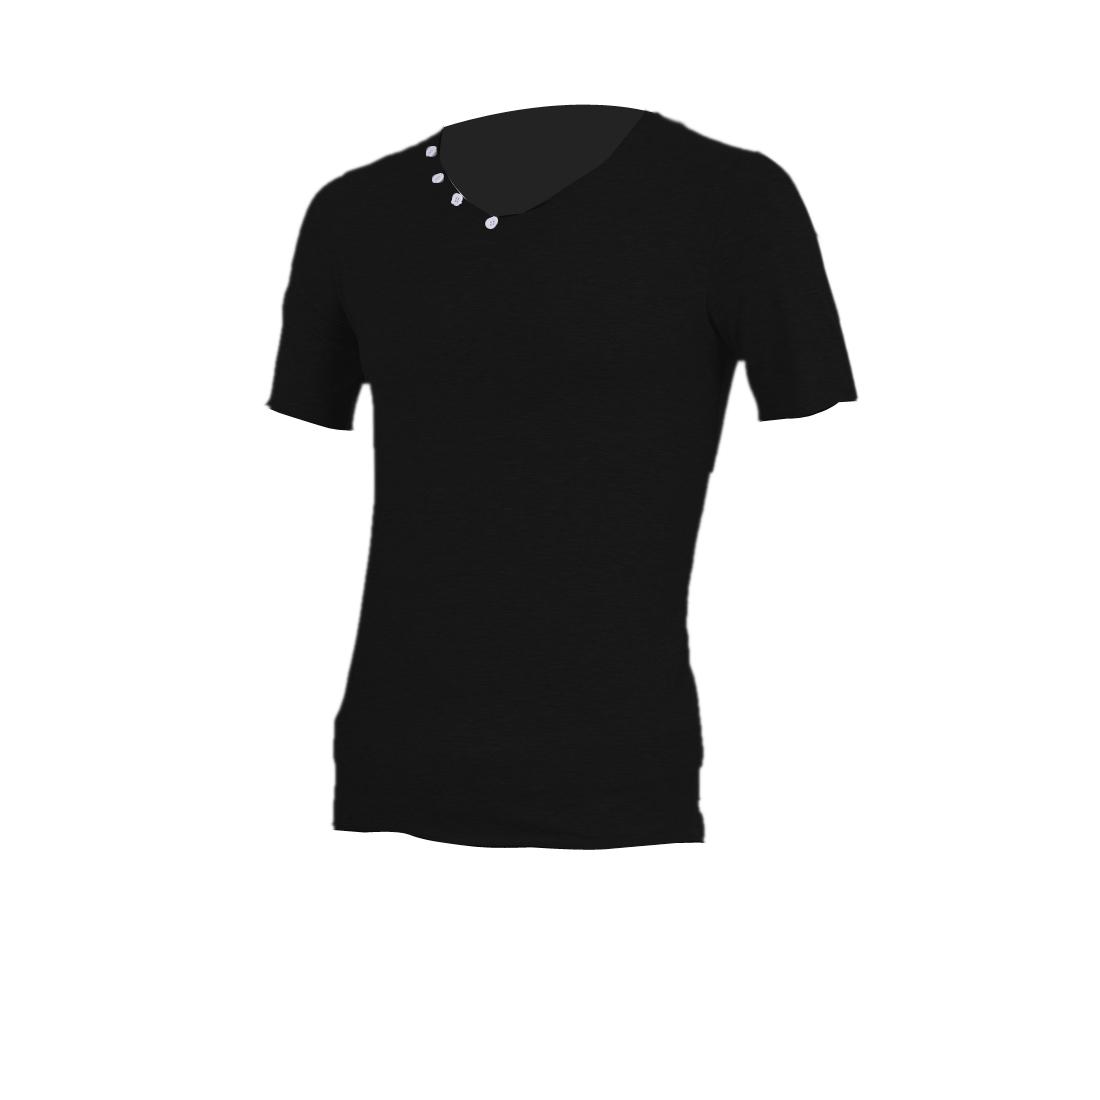 Short Sleeve Slim Fit Design Stylish Men Fashionable Top Shirt M Black